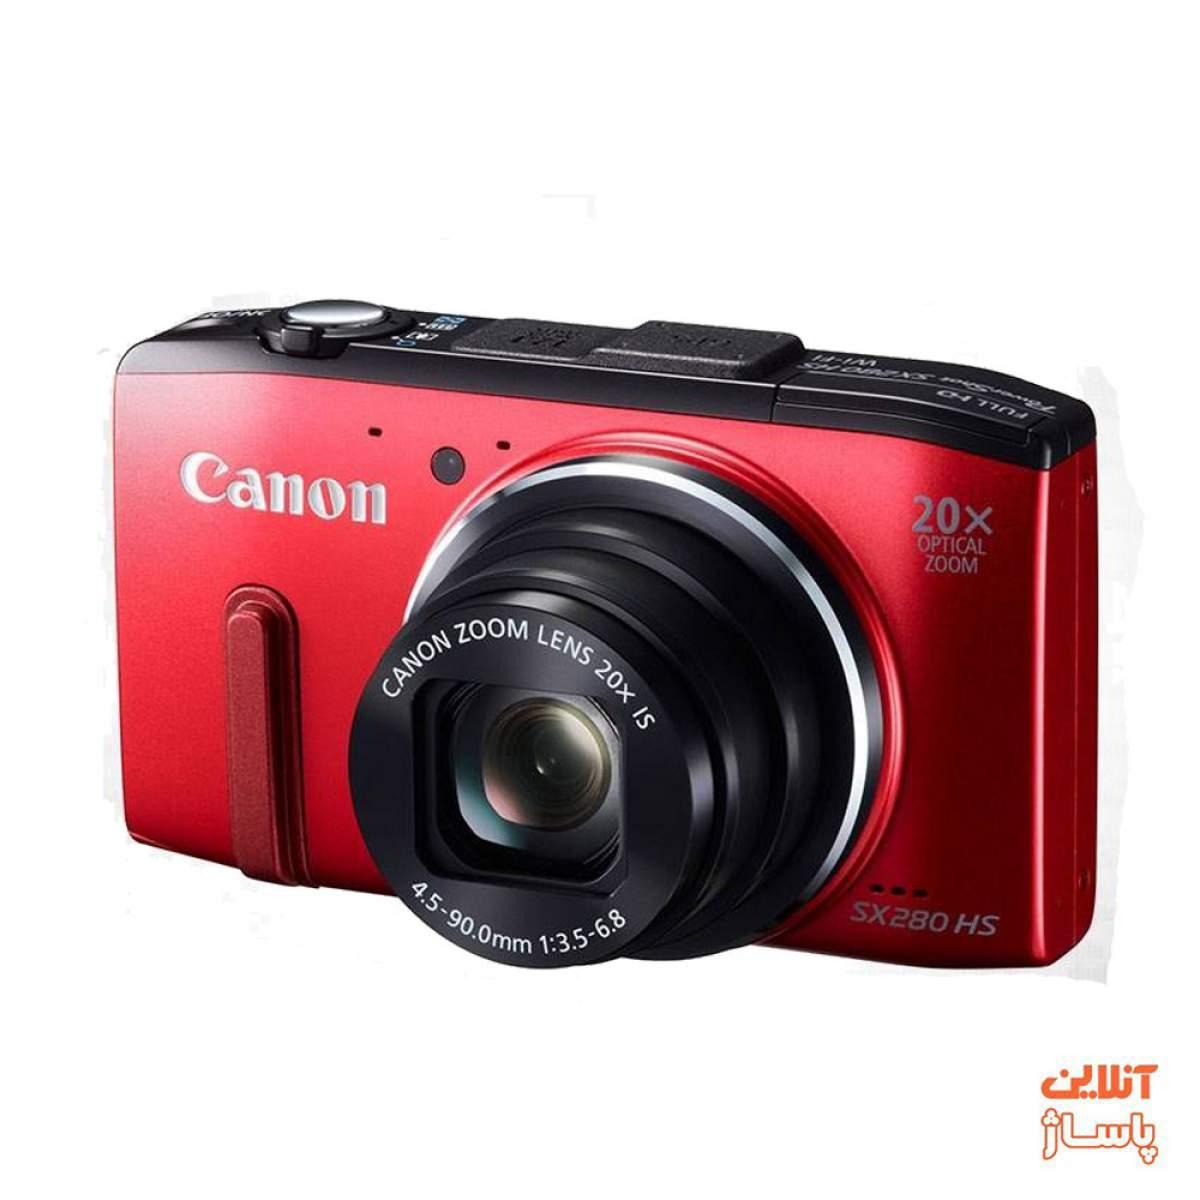 دوربین دیجیتال کانن مدل Powershot SX280 HS